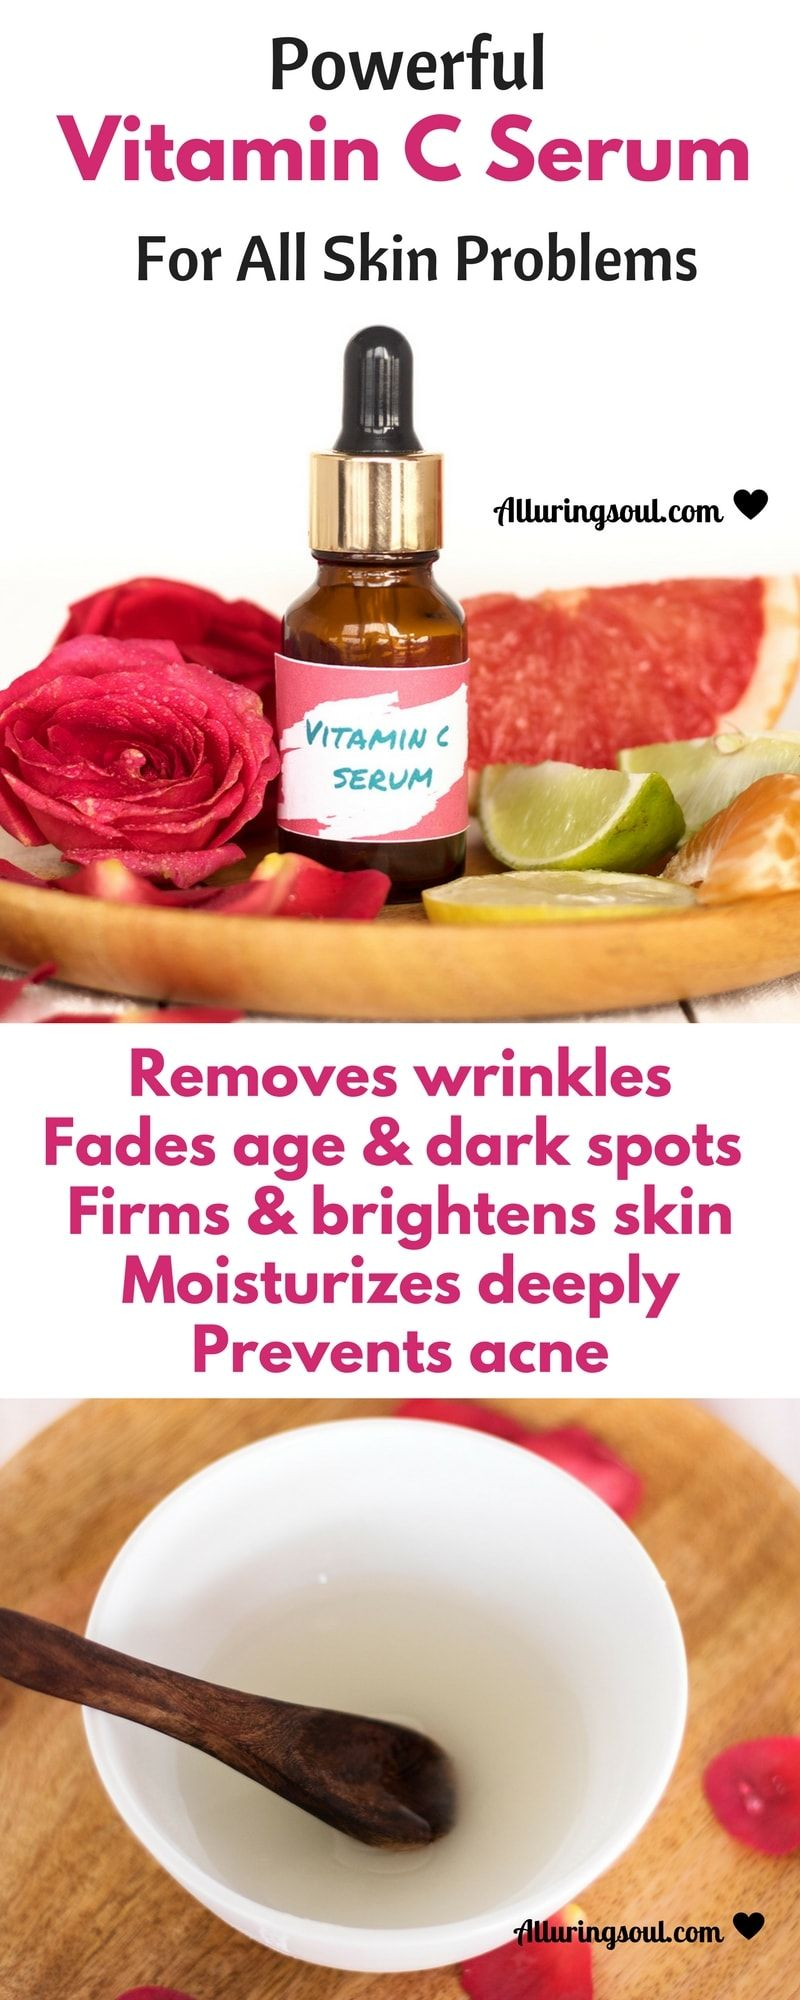 Powerful Vitamin C Serum For Every Skin Problem  Recipe  Acne Skin